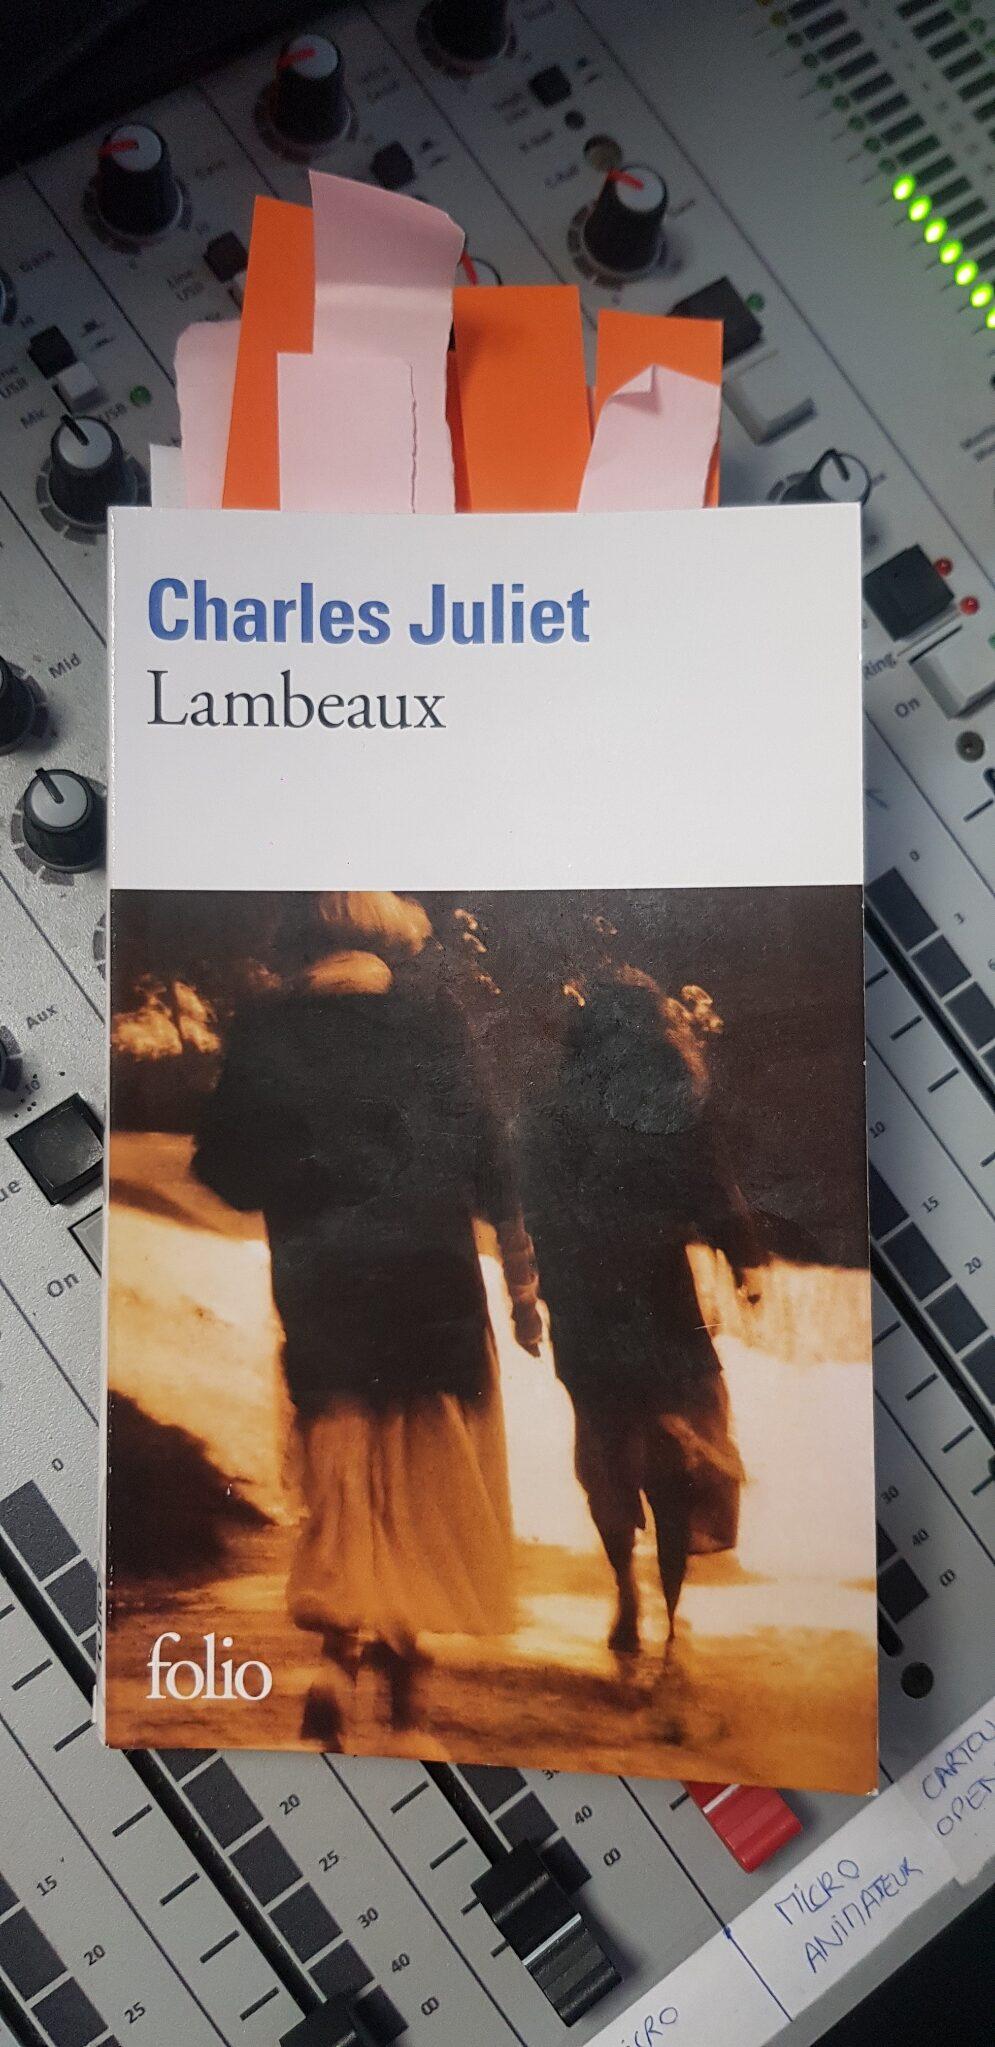 20210521_Lambeaux_Charles_Juliet